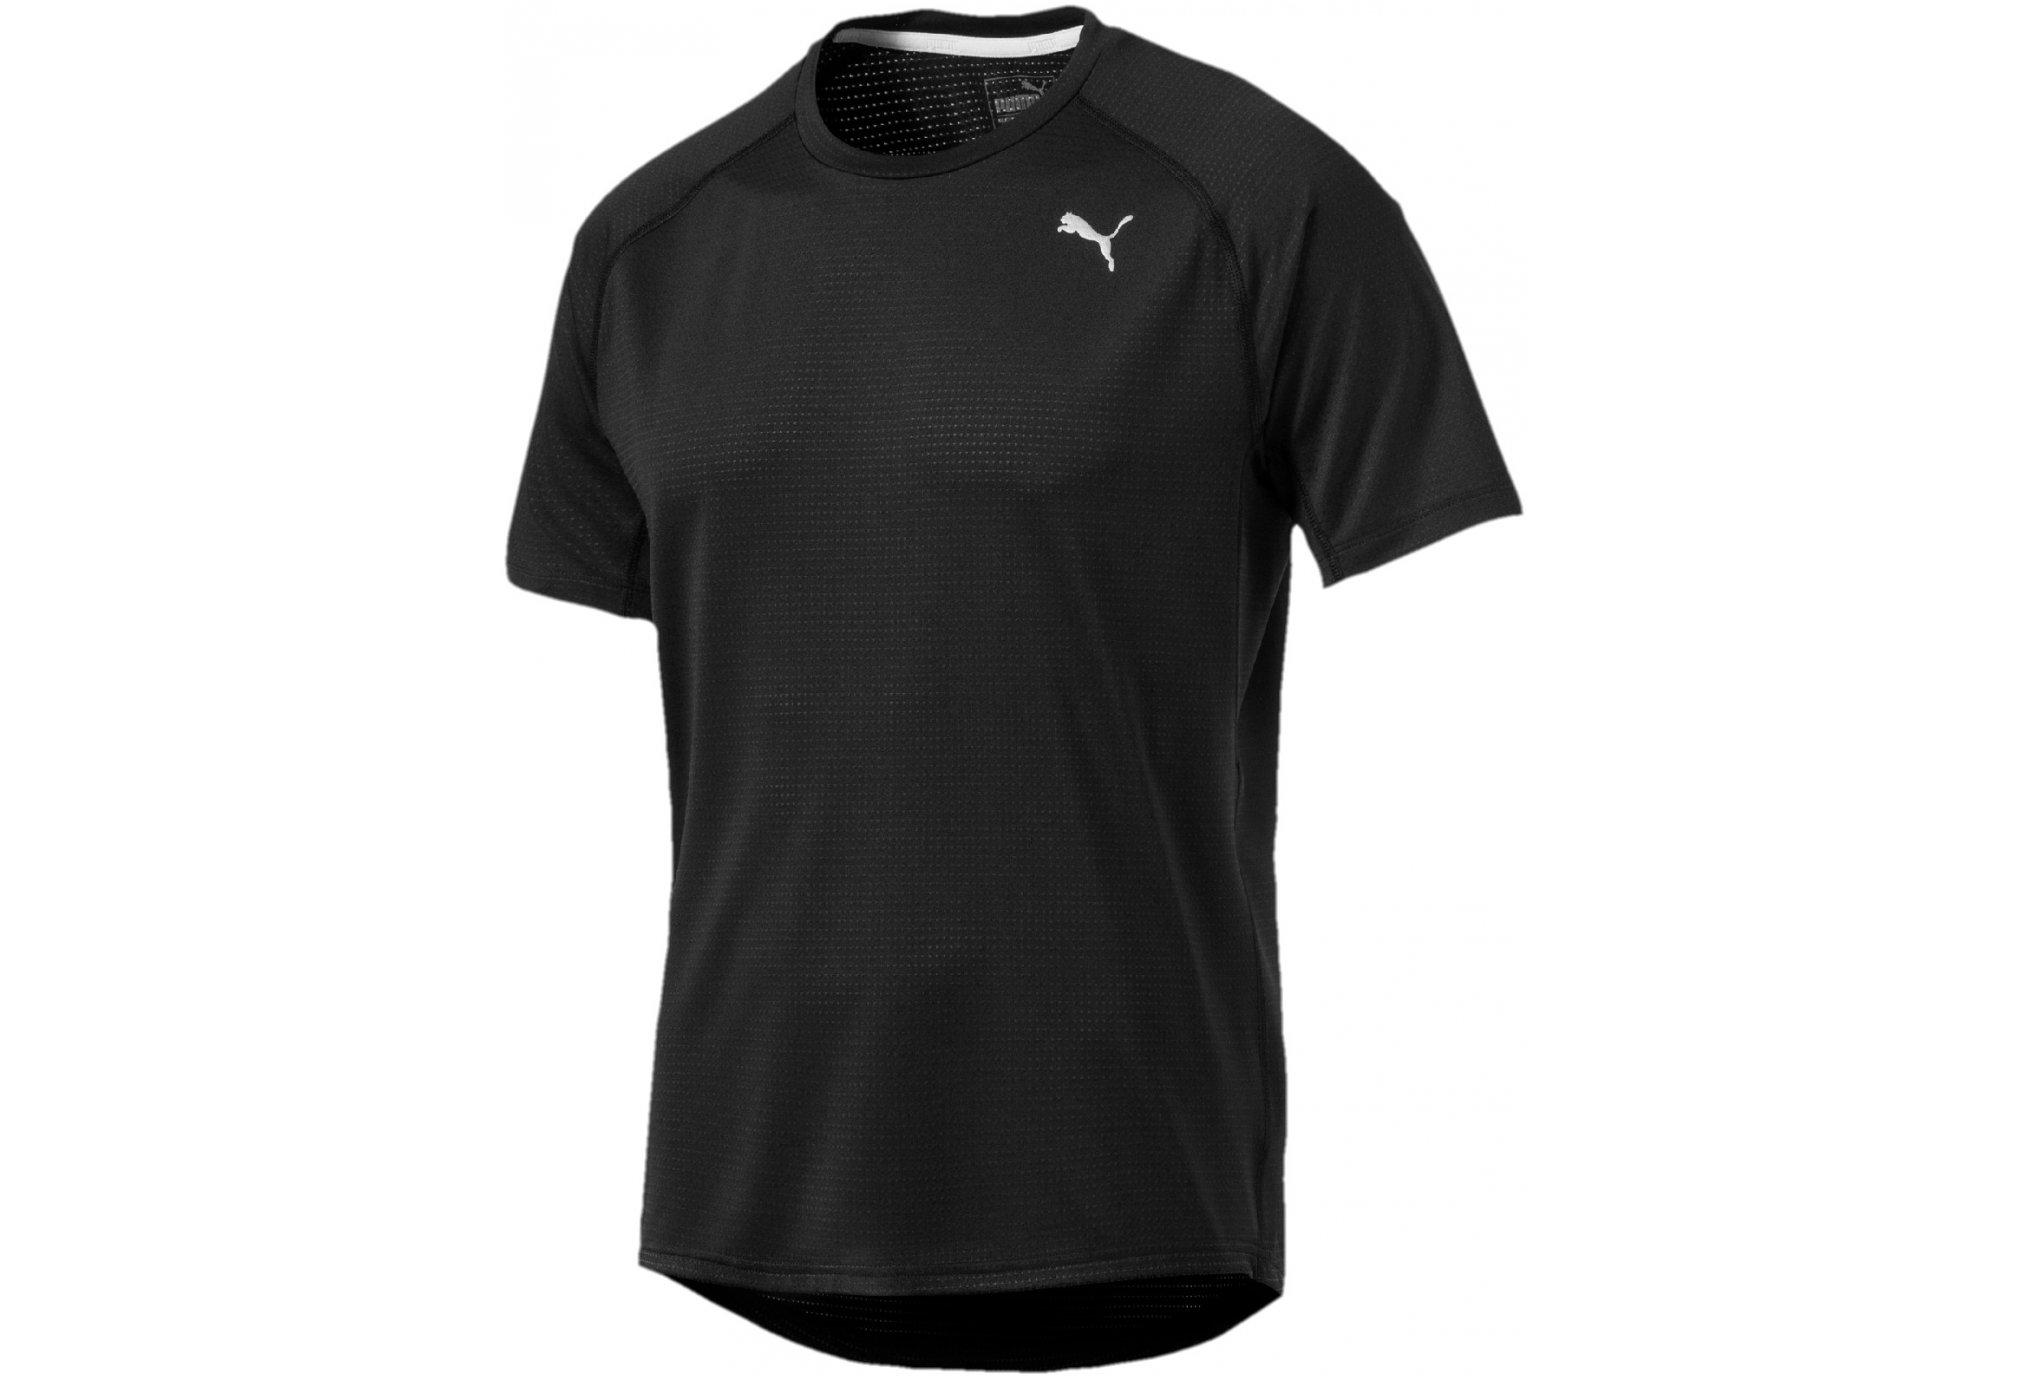 Puma Running Speed M Diététique Vêtements homme